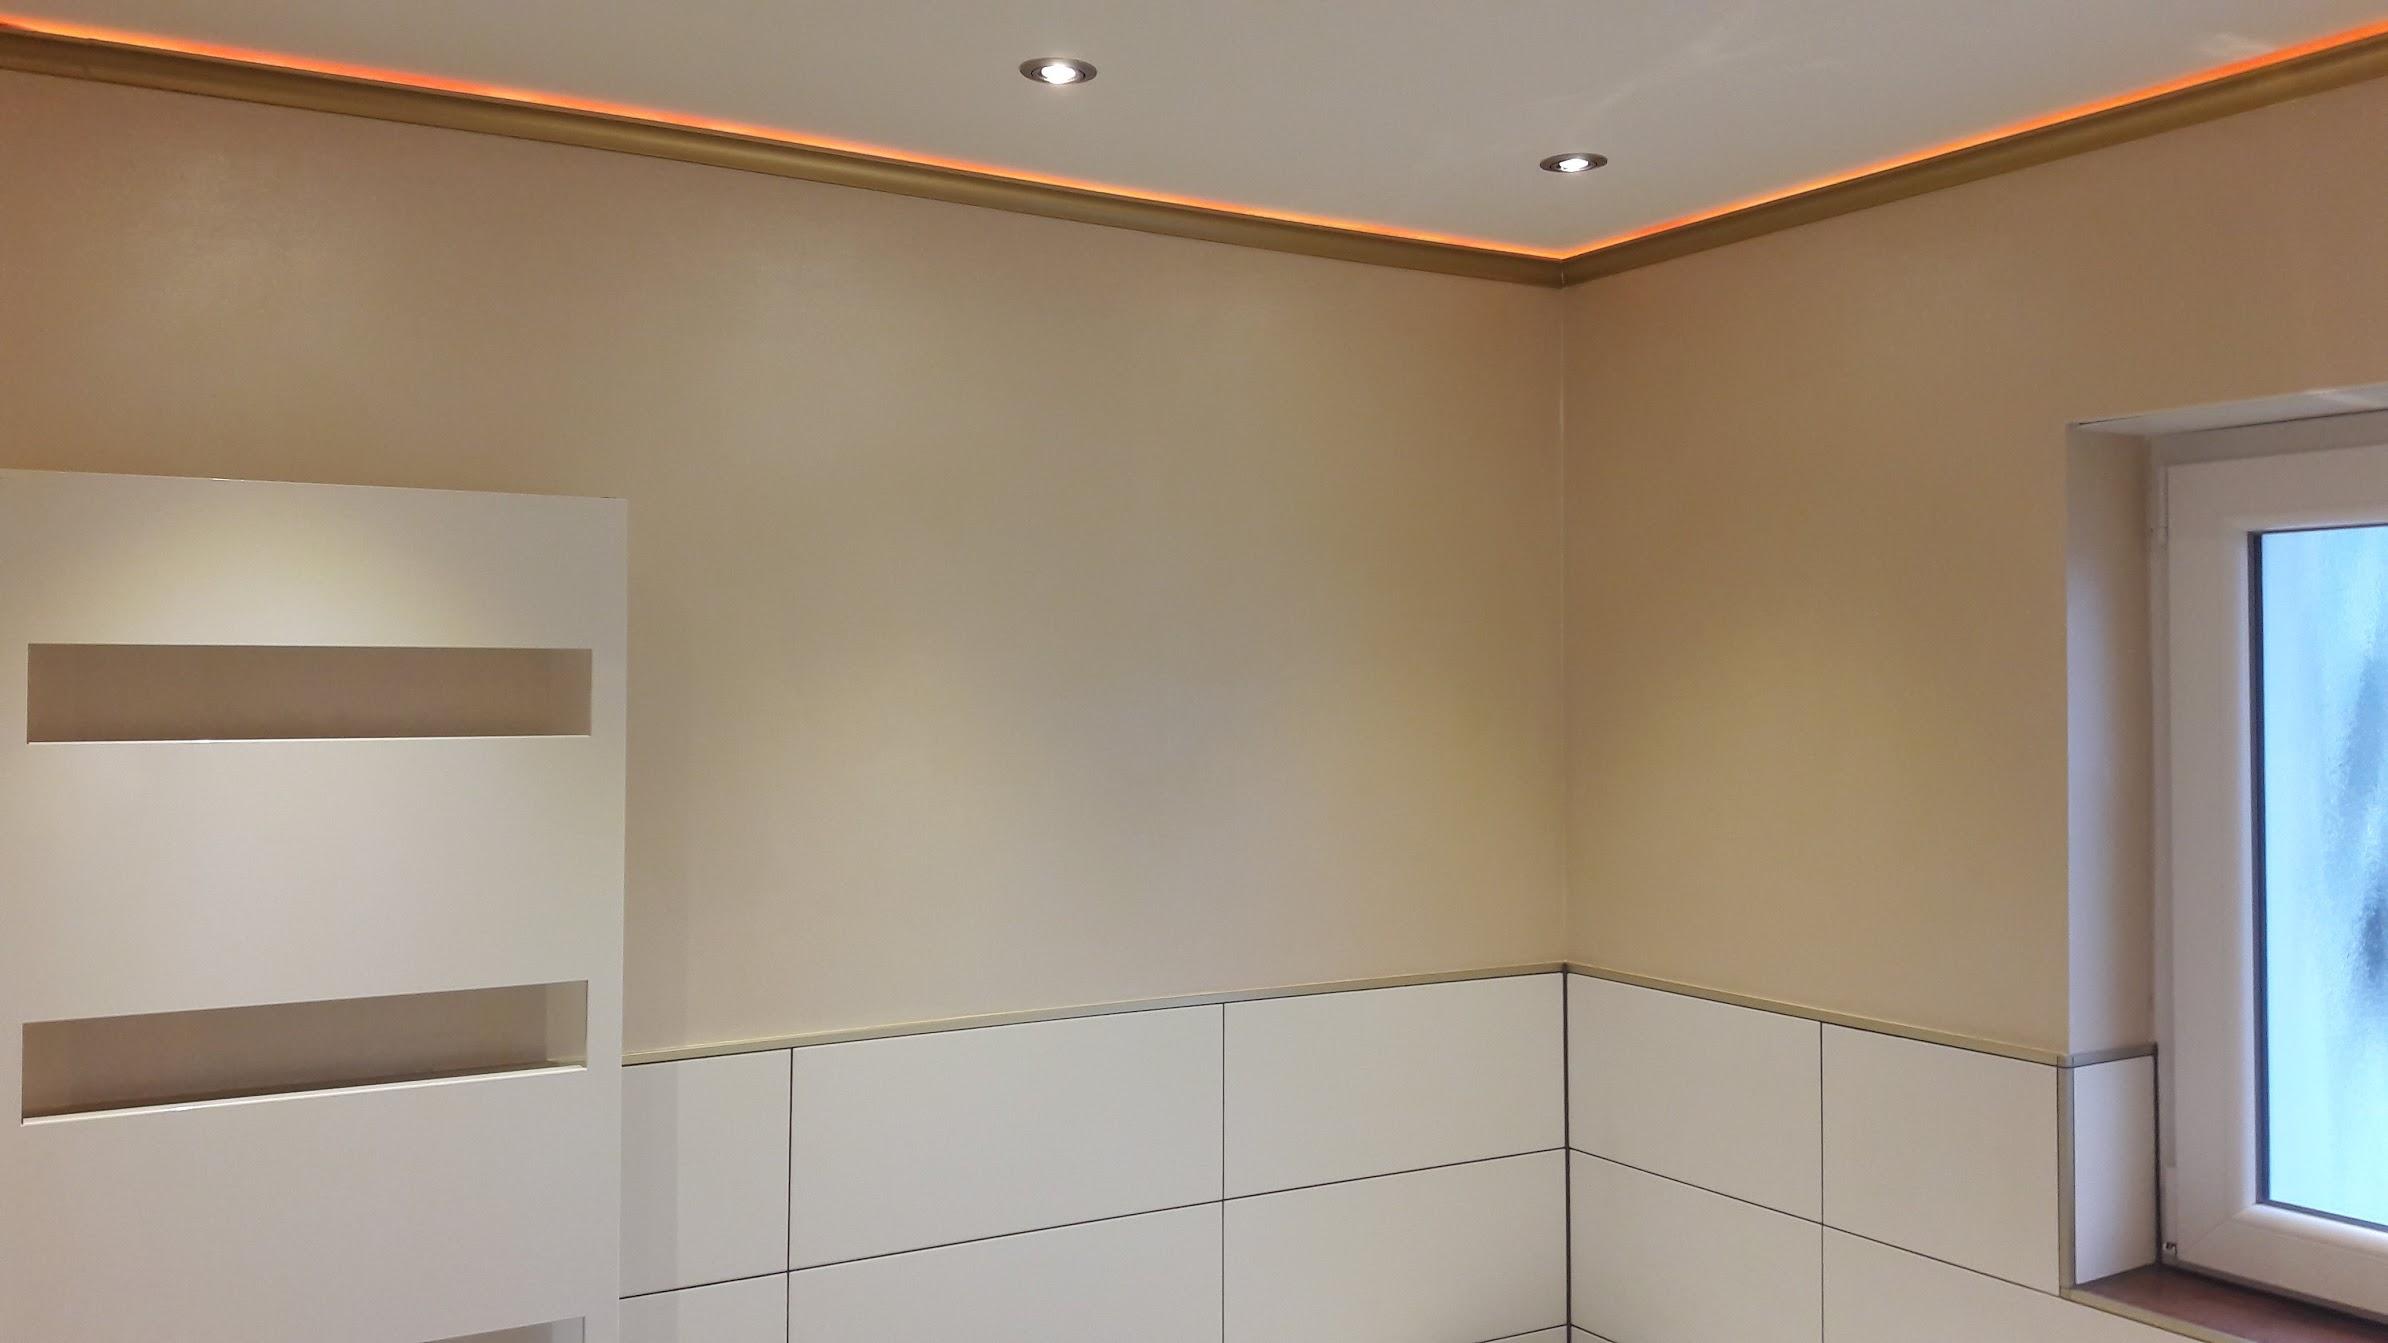 54.Stuckleisten-LED-Beleuchtung-Indirekte-Beleuchtung-Badezimmer